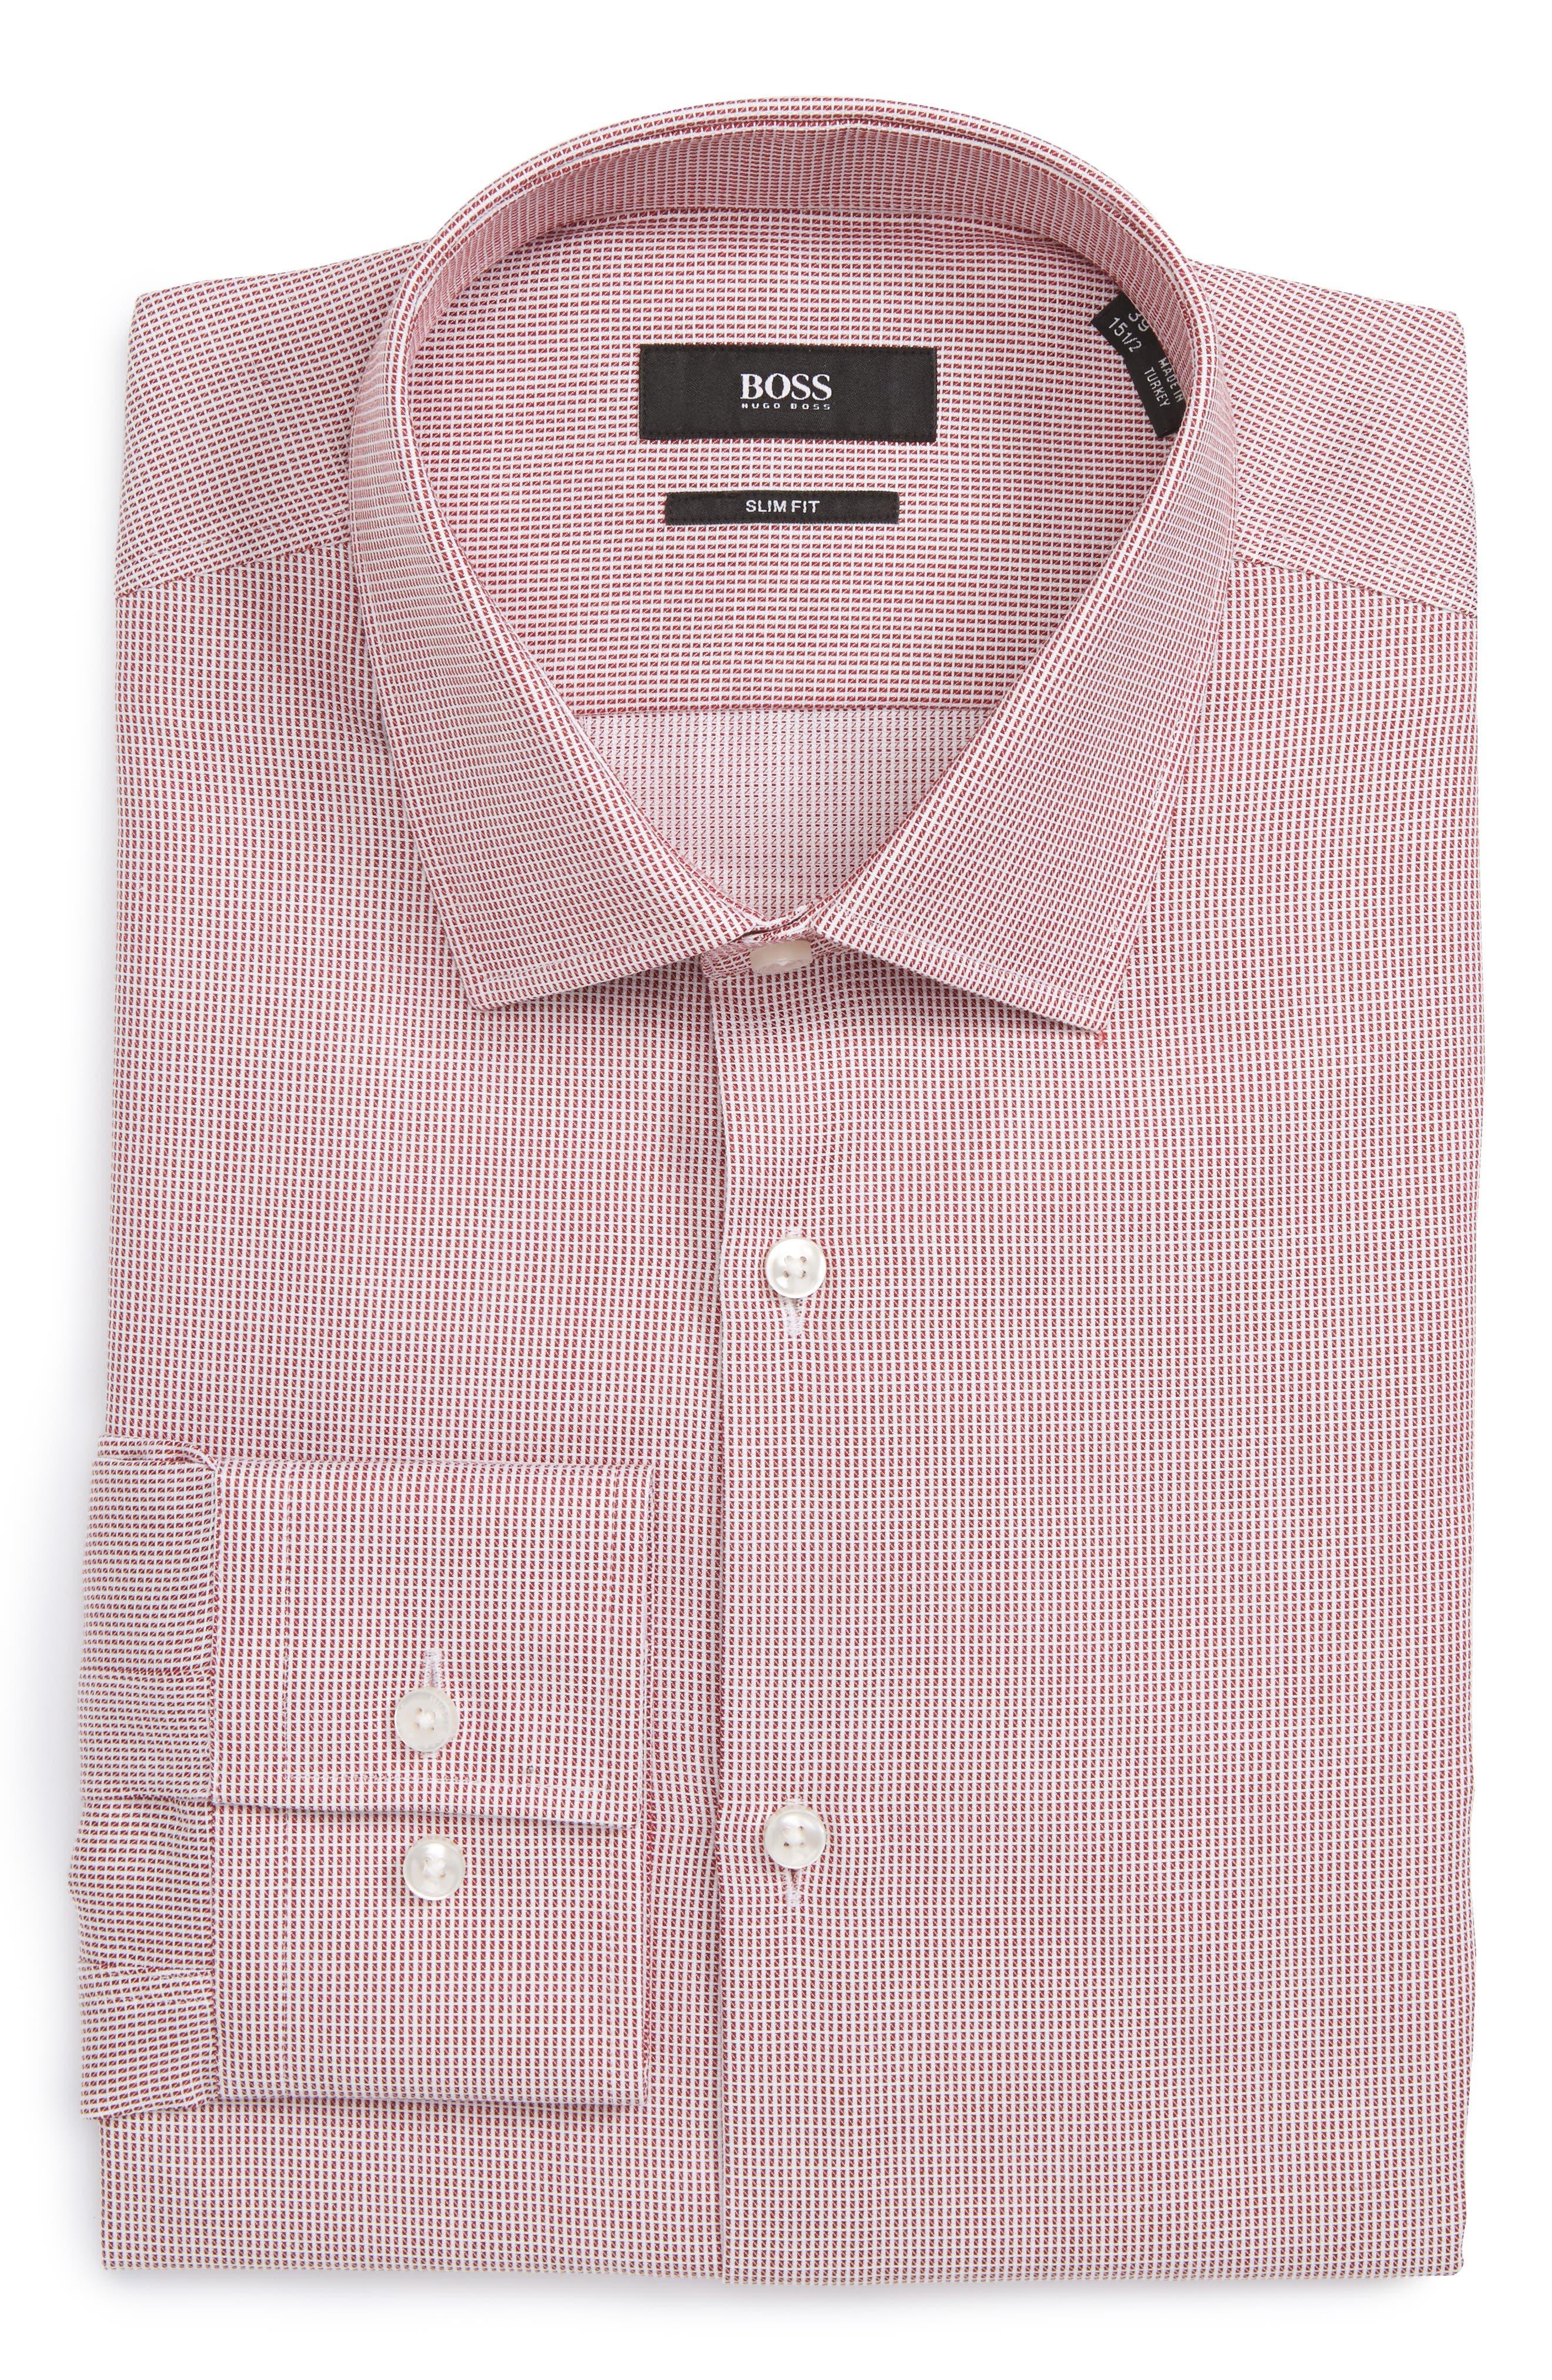 BOSS Slim Fit Check Dress Shirt